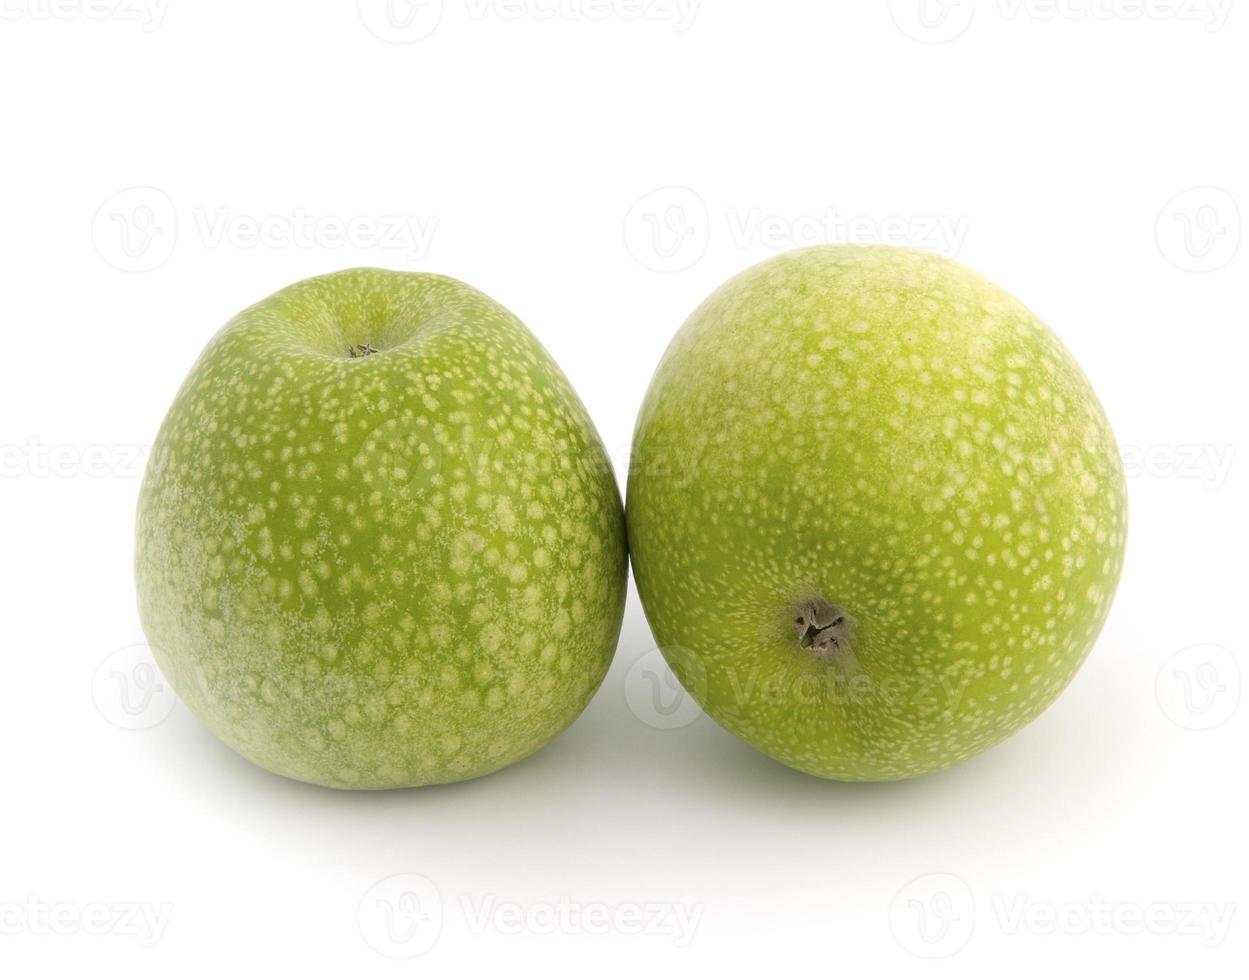 Granny Smith appels tegen witte achtergrond. foto